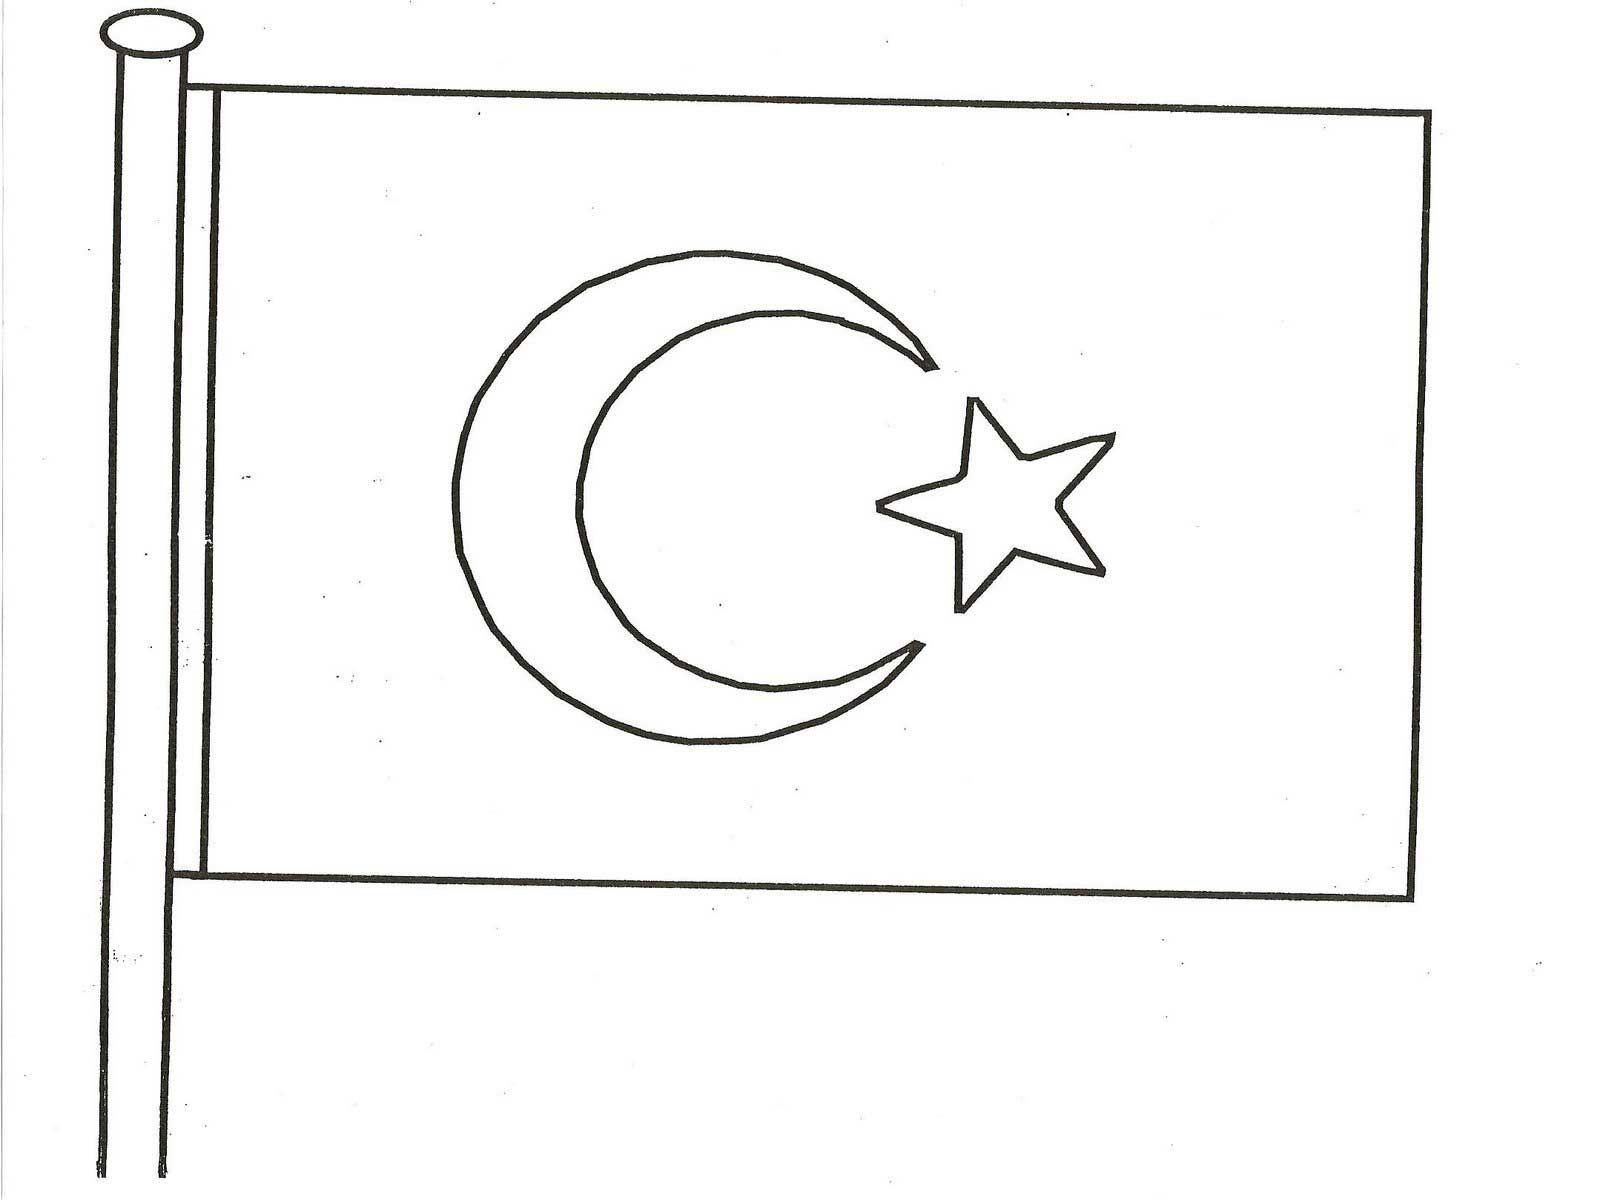 Turk Bayragi Boyama Kagidi Calismasi Turk Bayraklari Boyama Kagidi Boyama Sayfalari Bayrak